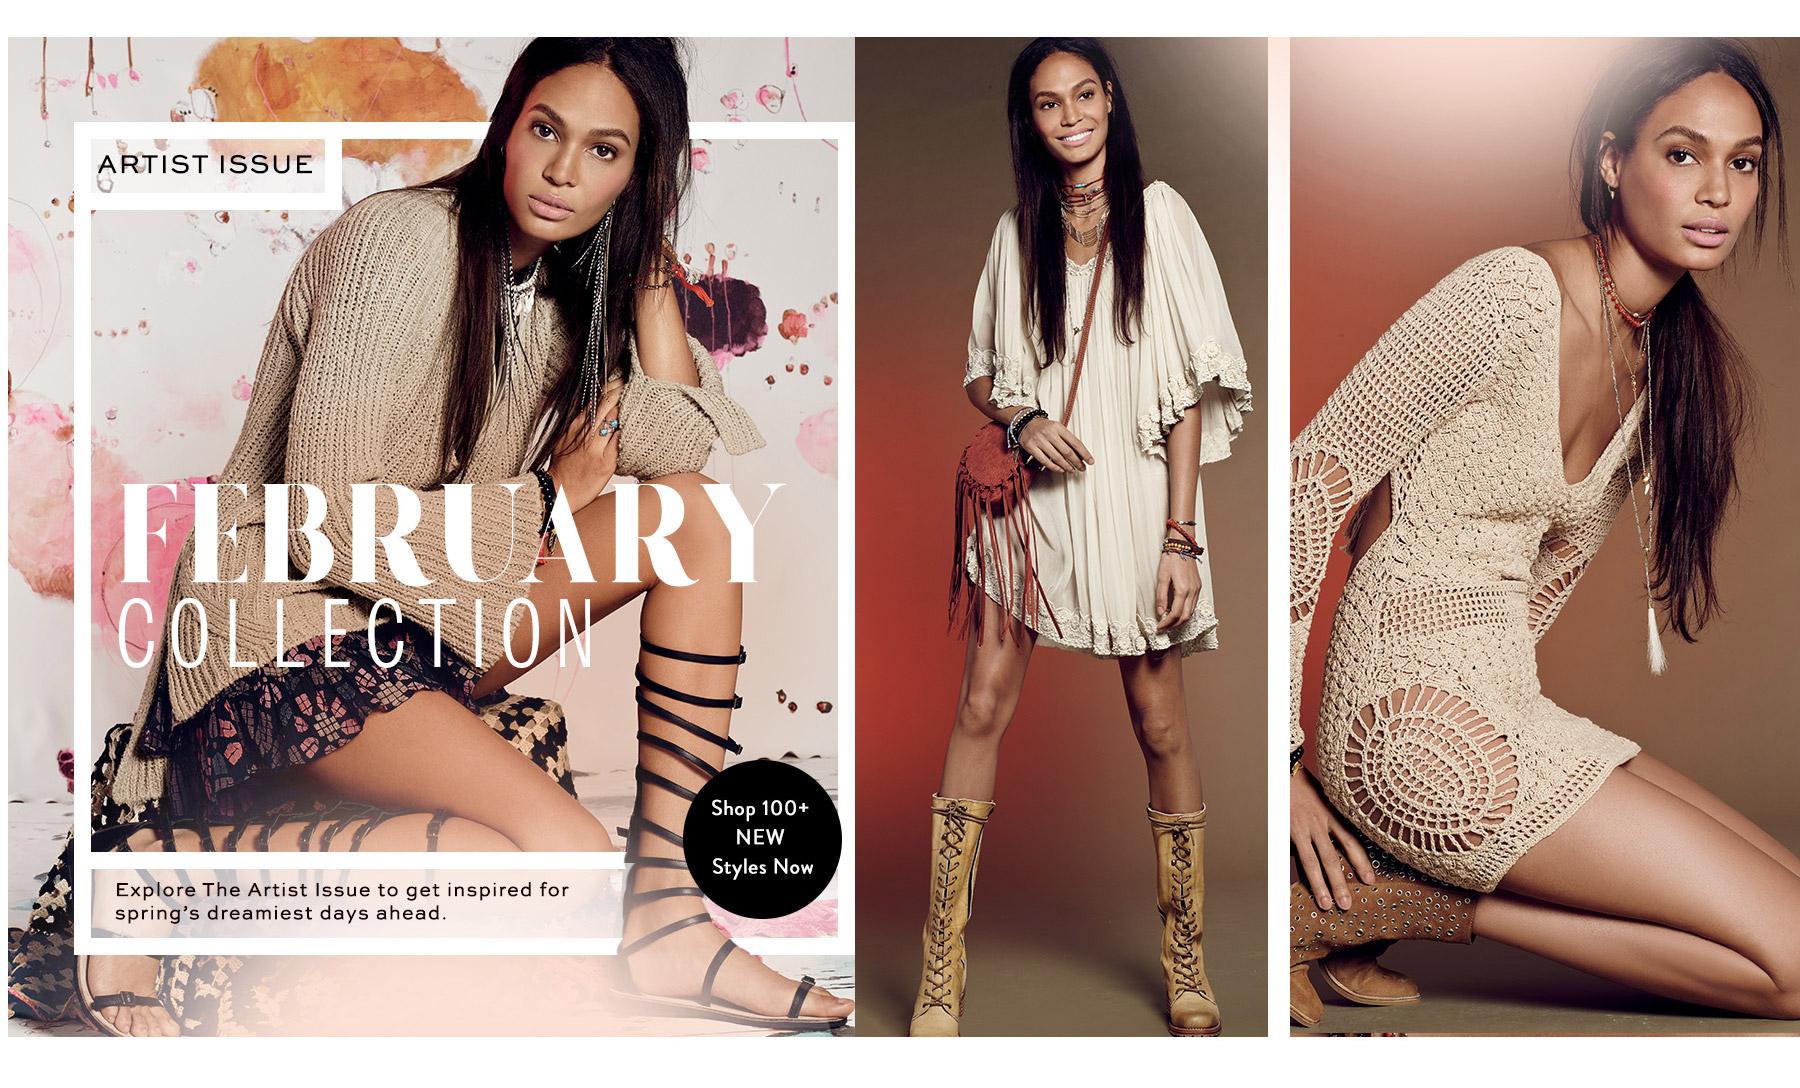 Shop the Feburary 2016 Catalog at Free People